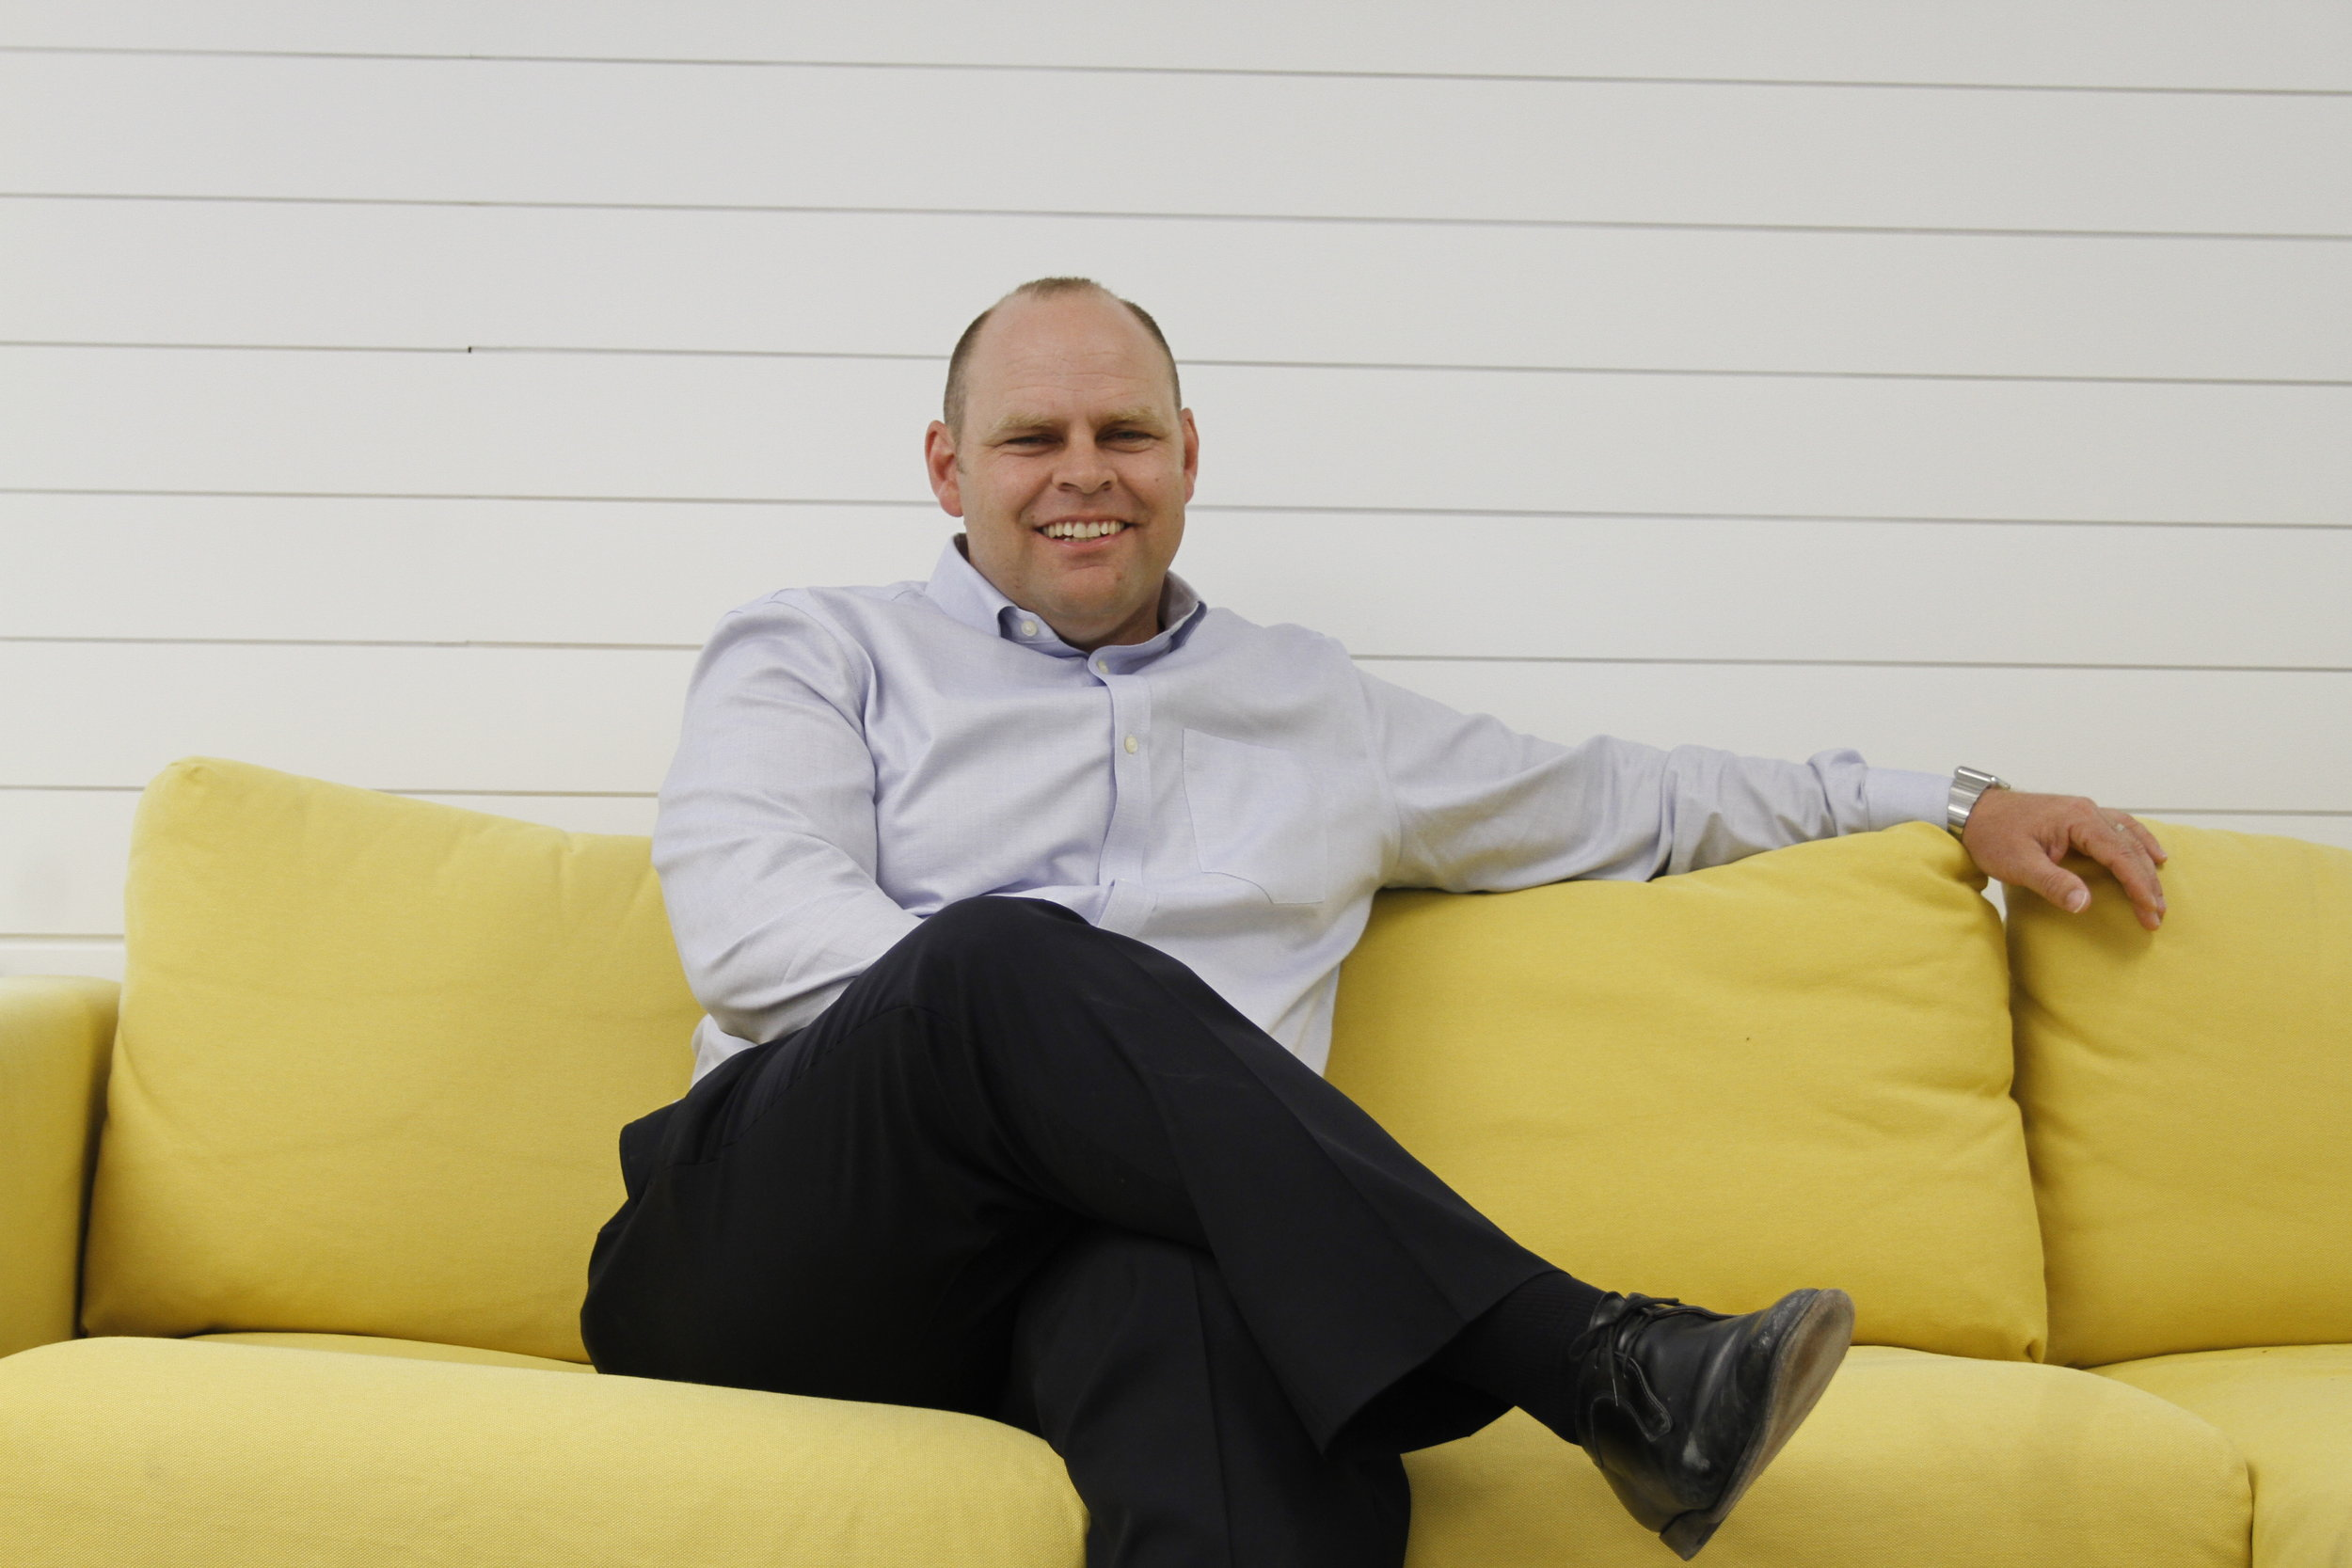 AJ Keilty - President and CEO